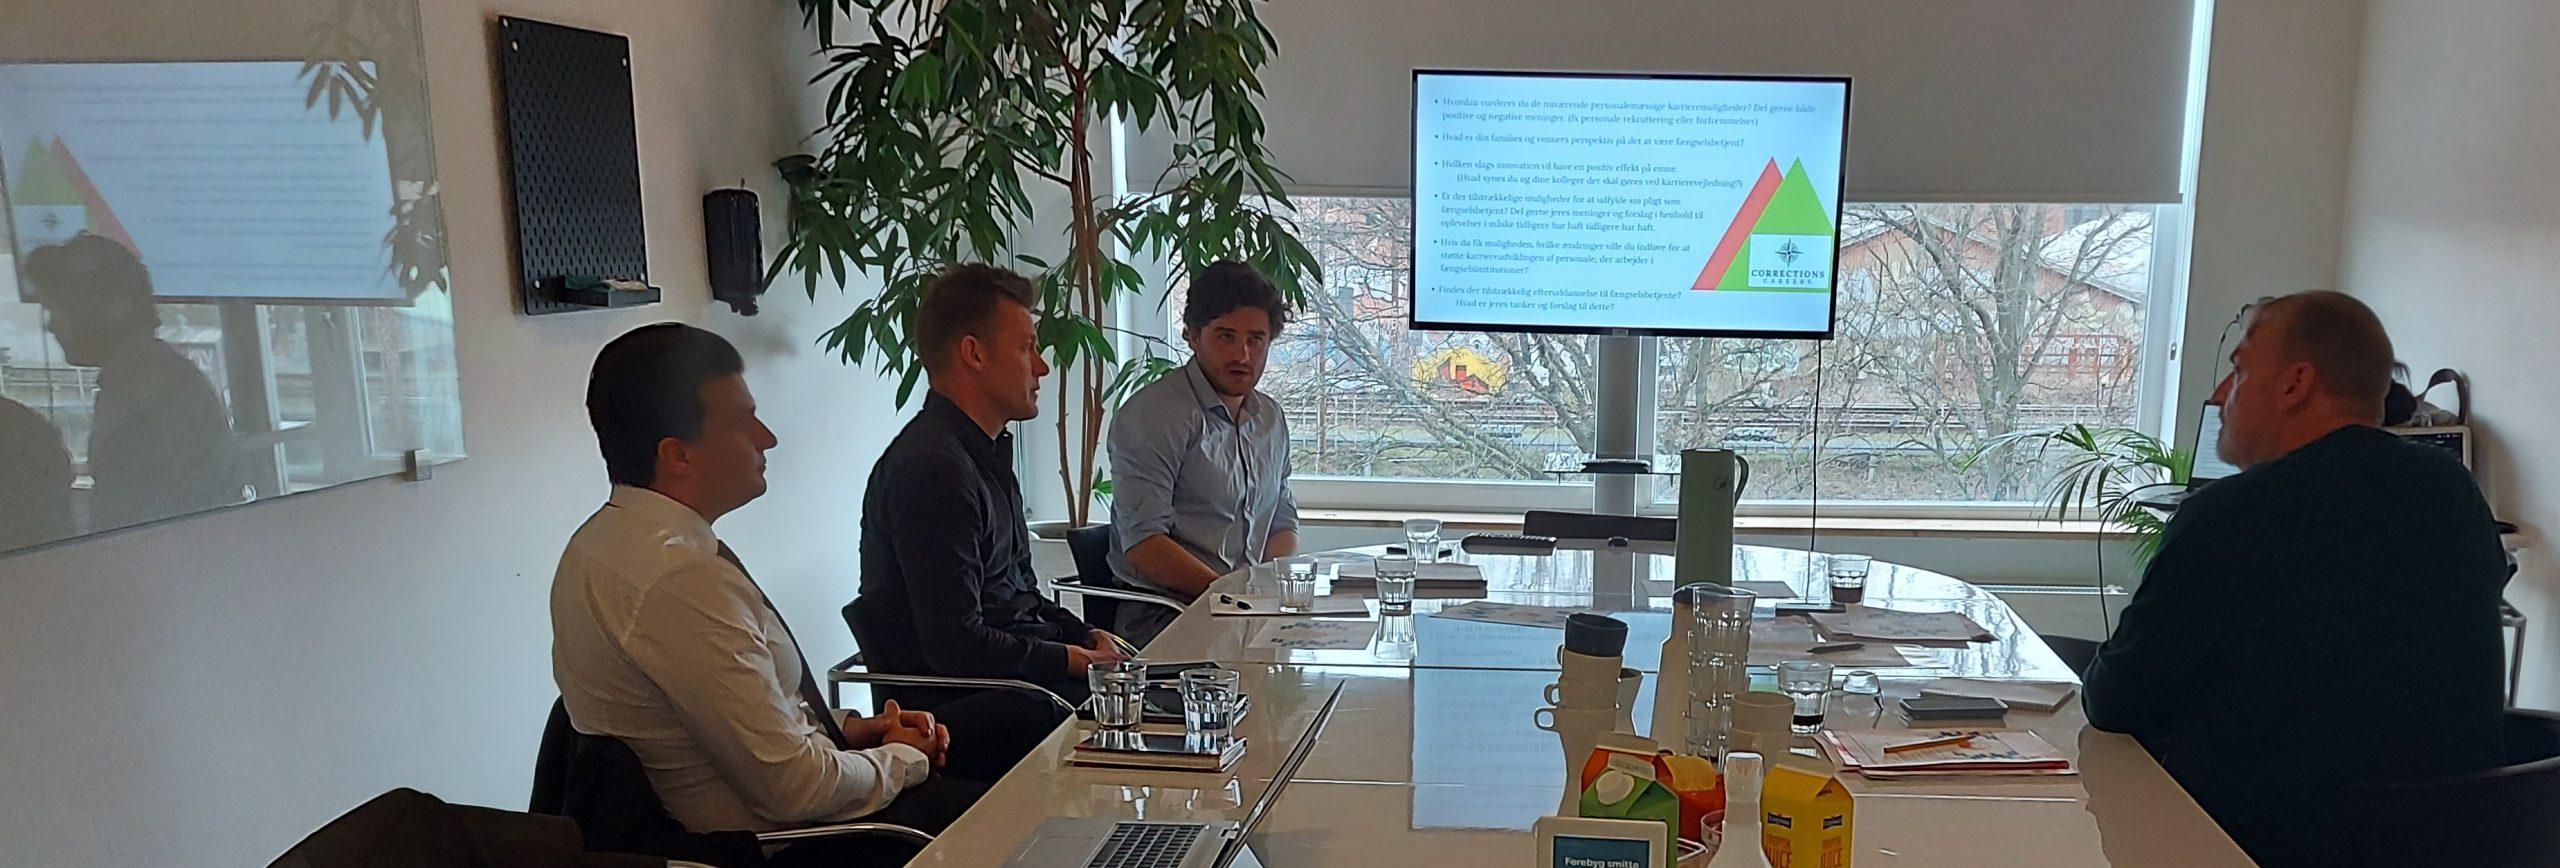 Career Guidance & Emotional Intelligence Training for Prison Service Employees Workshop with representatives from the Danish Prison Federation (Fængselsforbundet)